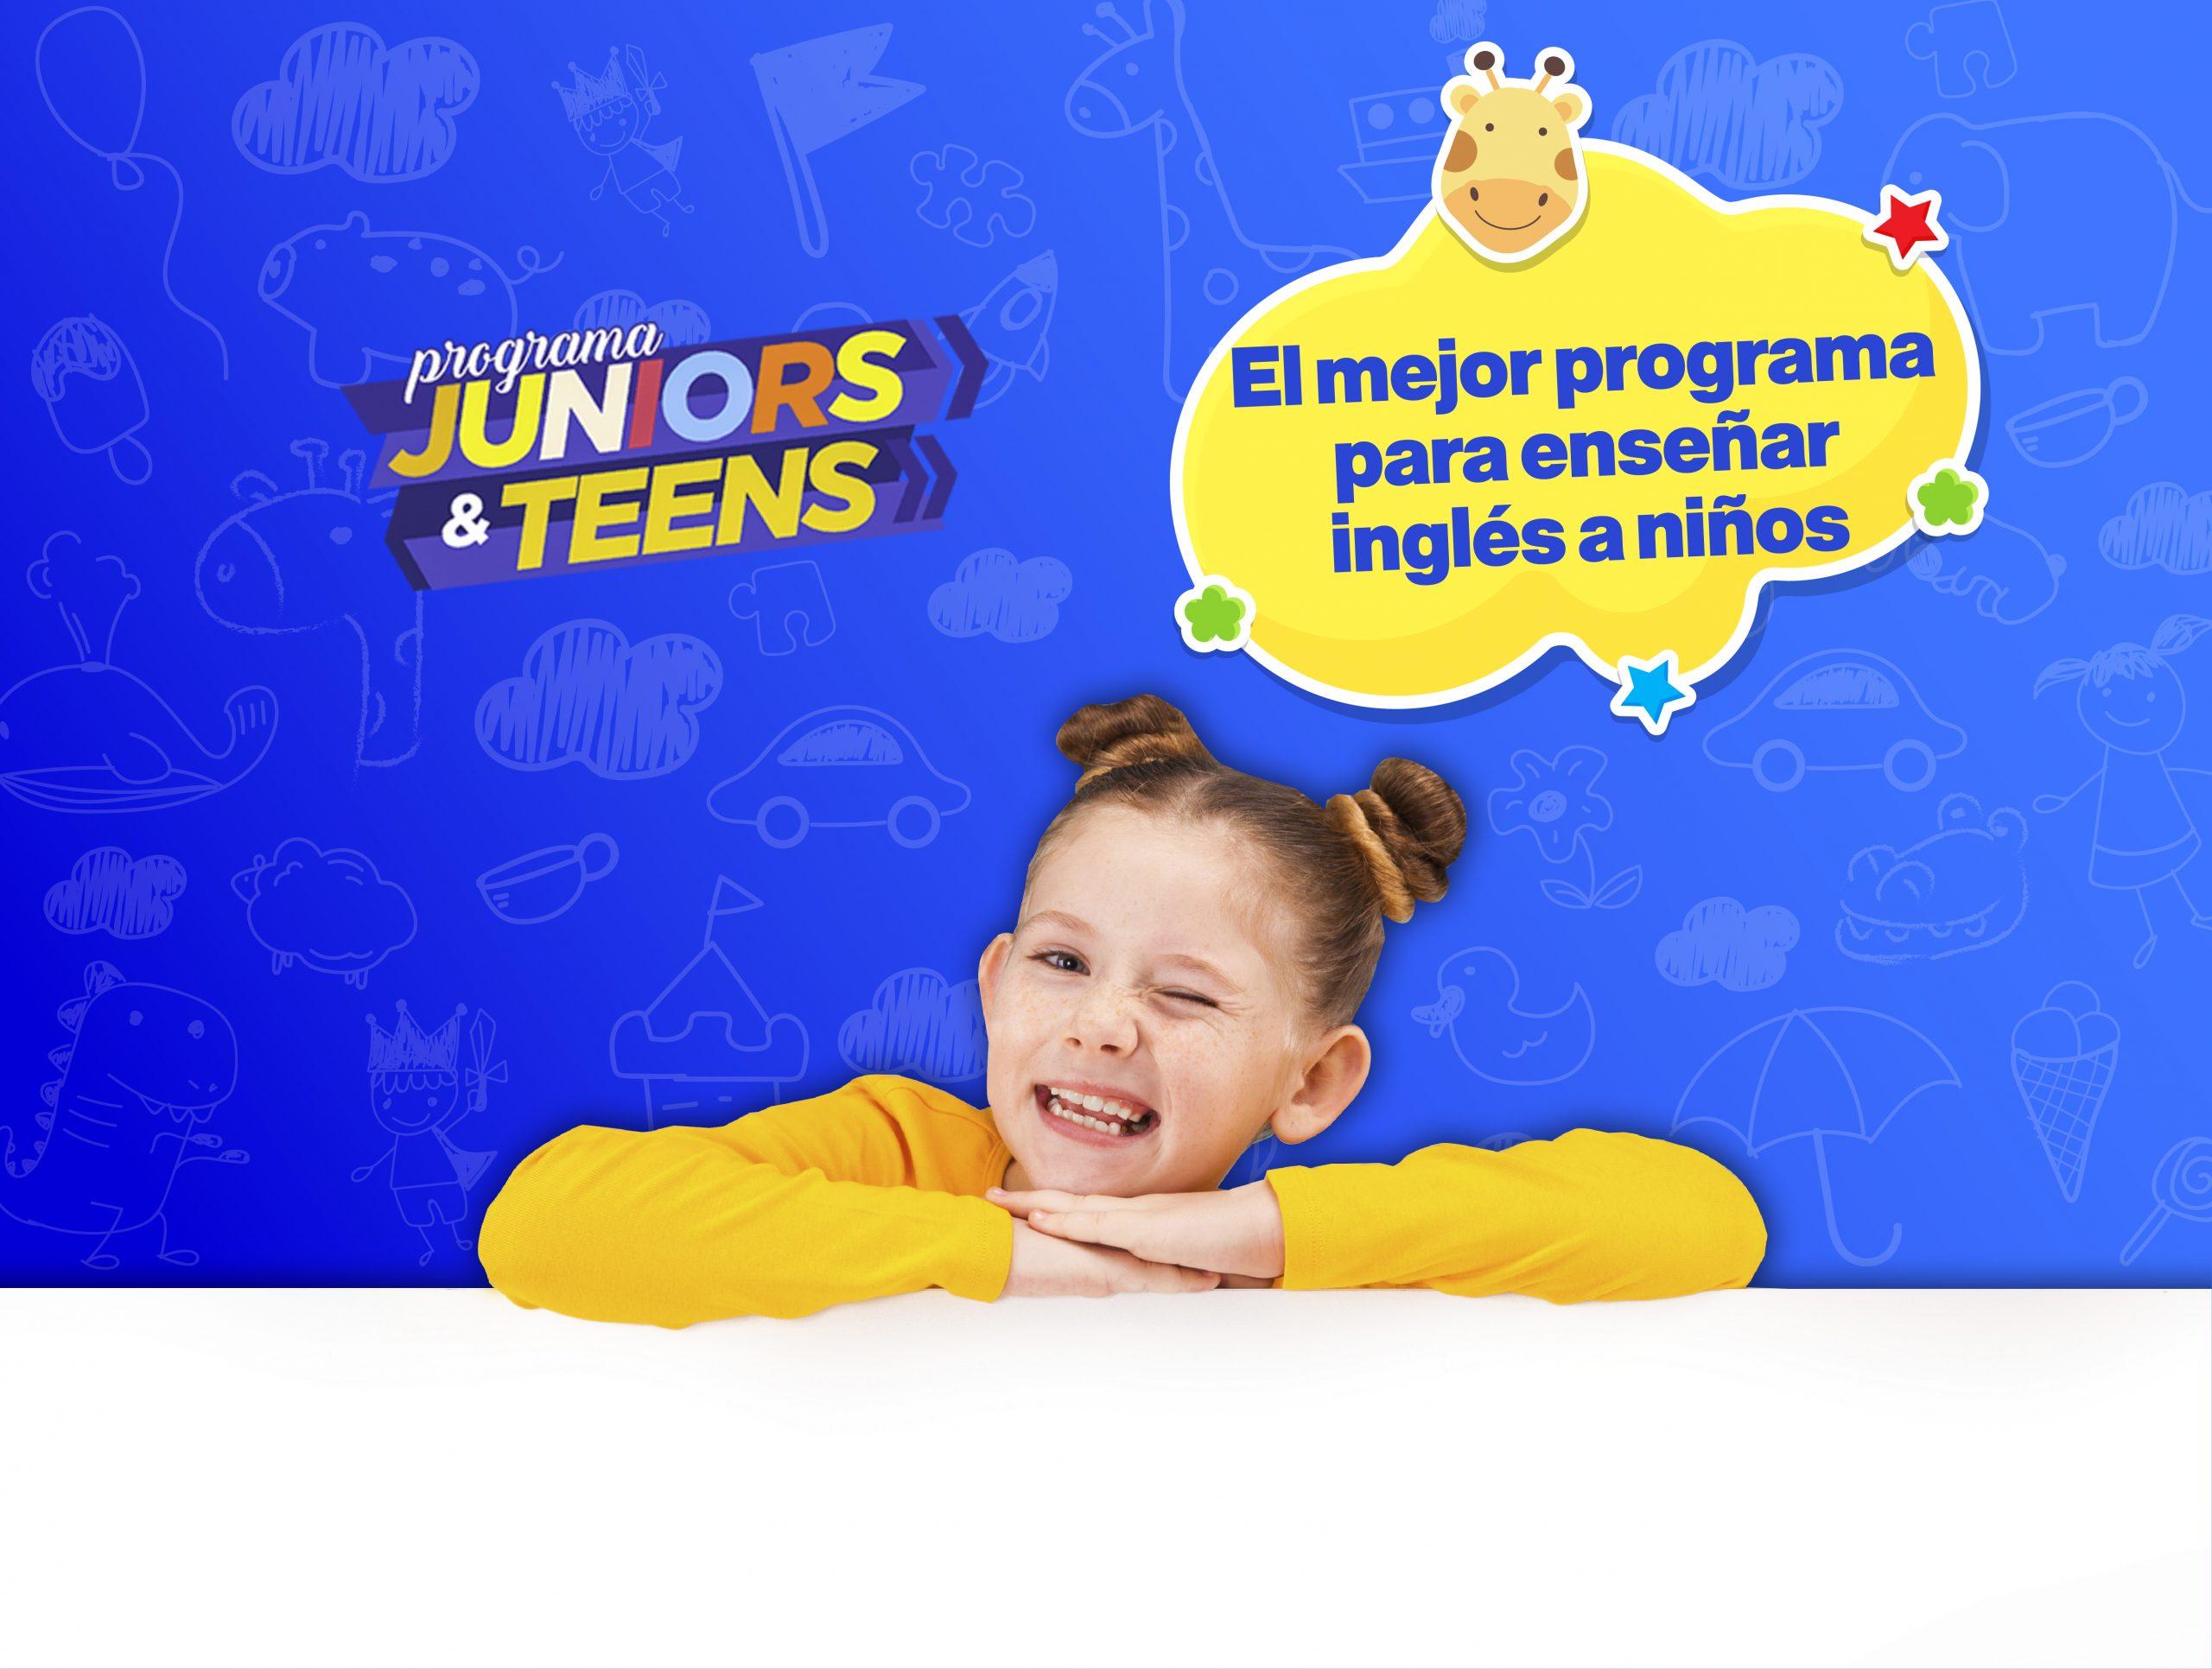 Juniors &Teens programa para enseñar inglés a niños